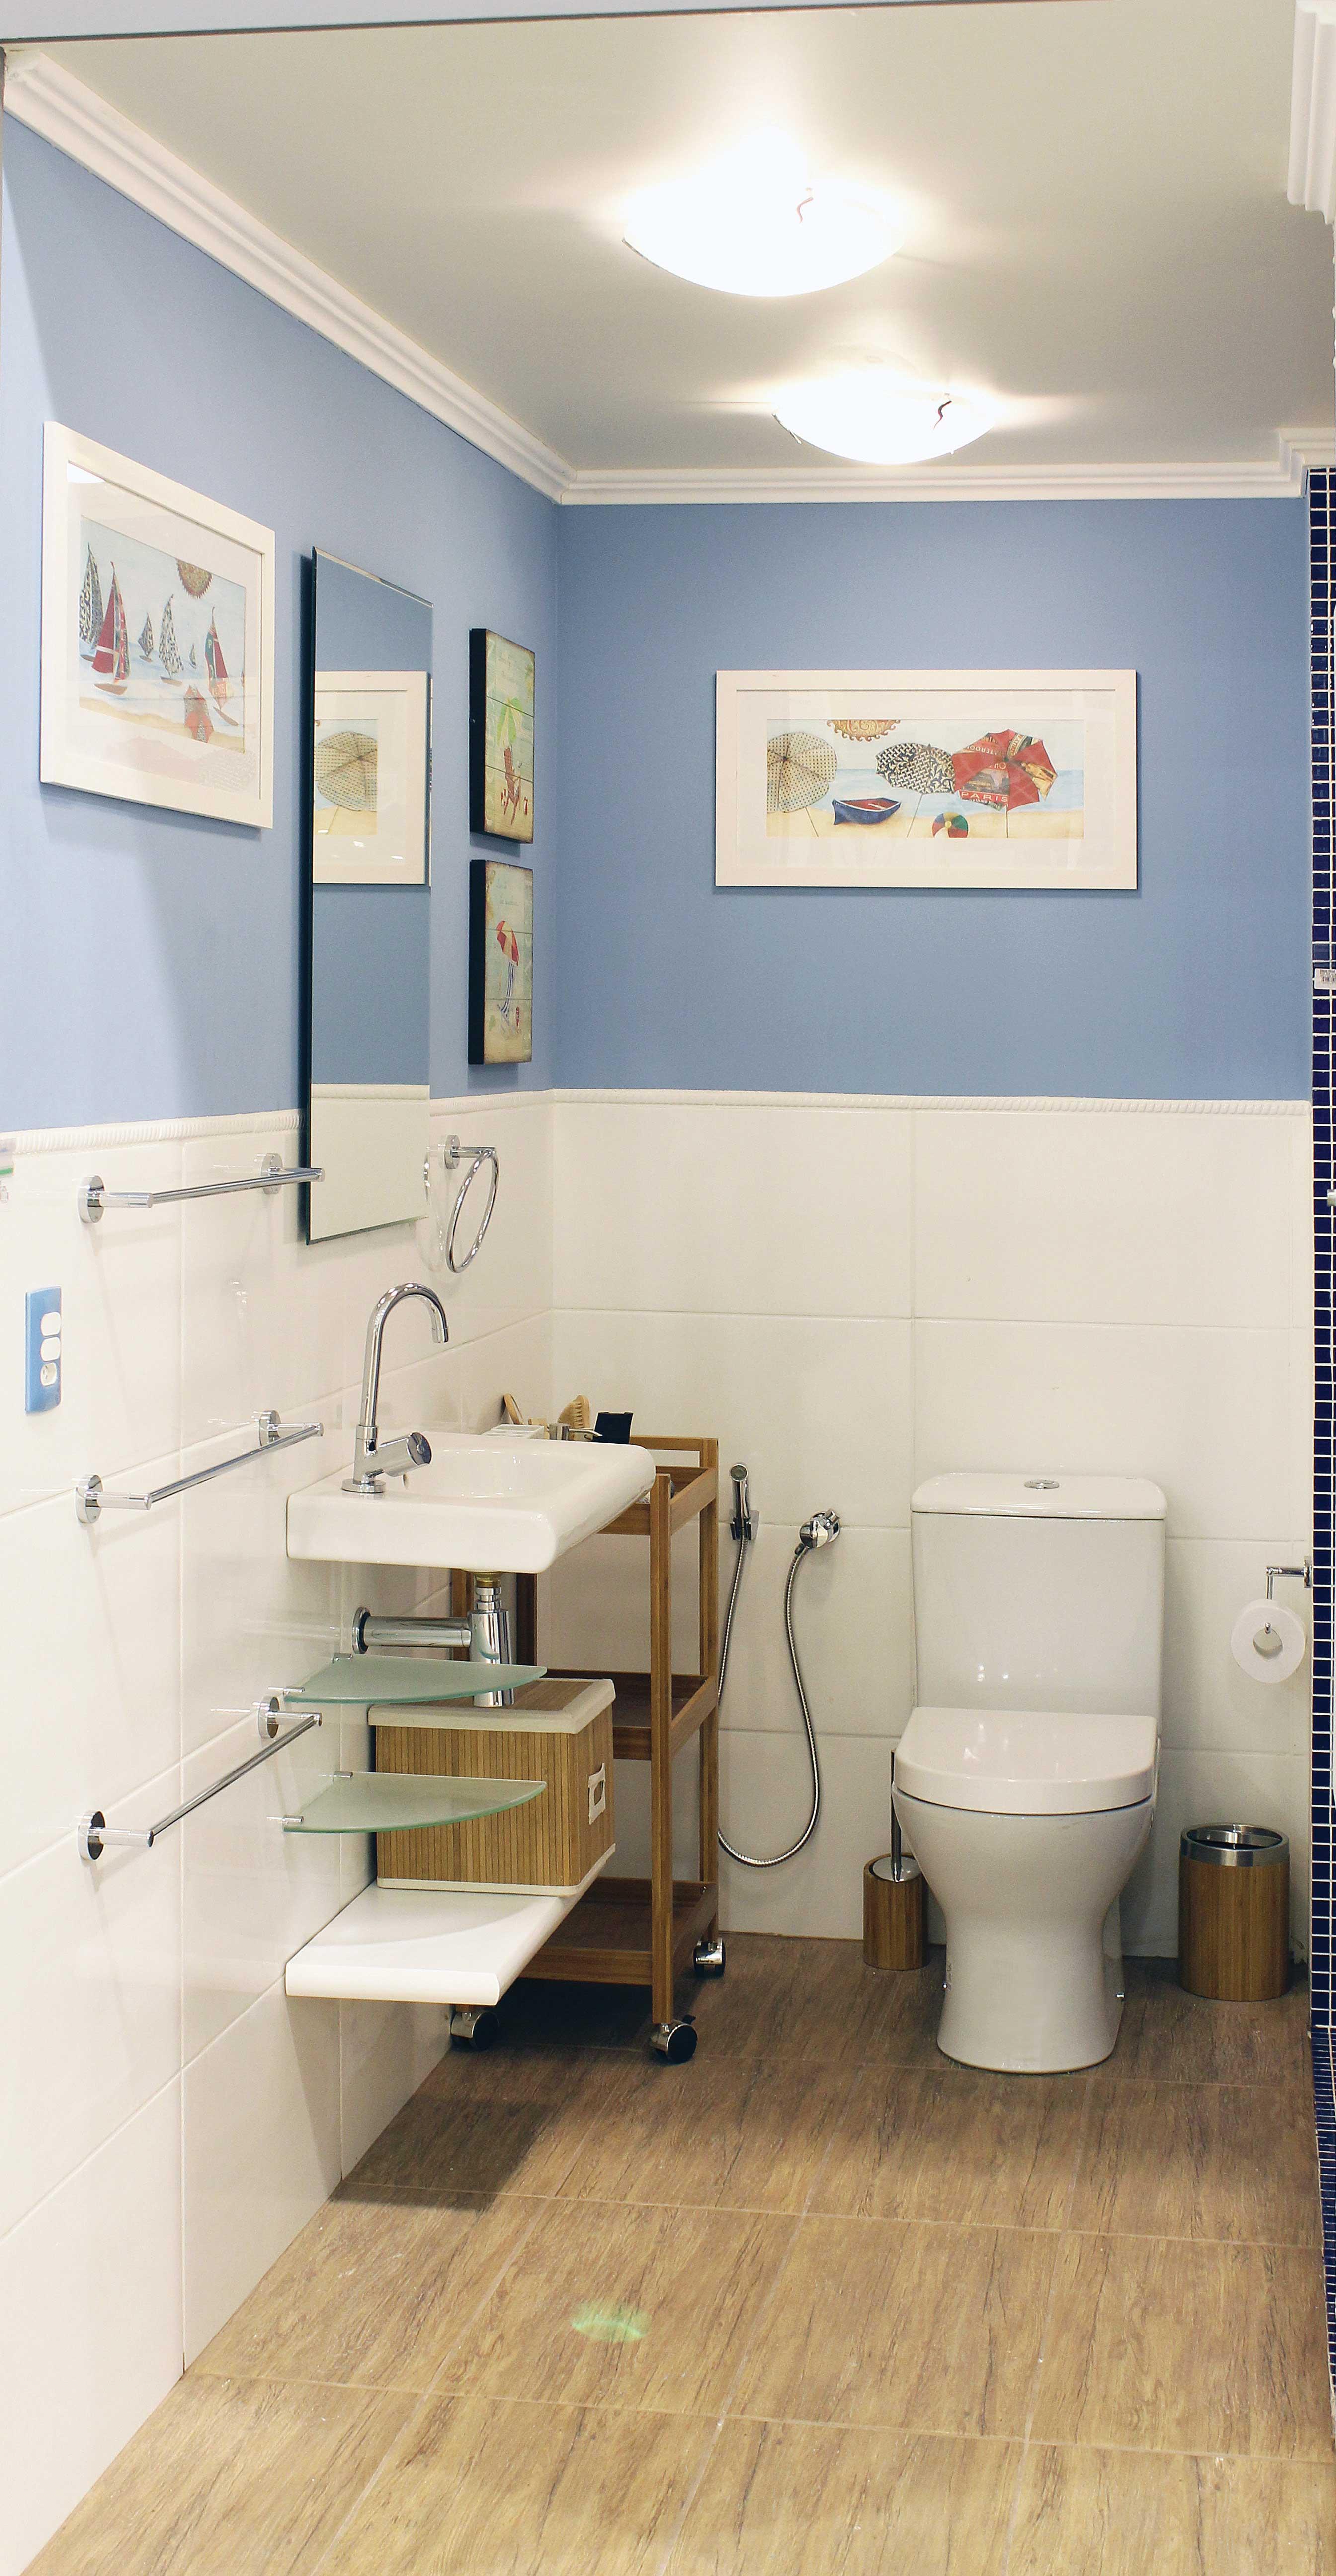 Banheiro pequeno decorado leroy merlin for Lavabo pequeno leroy merlin